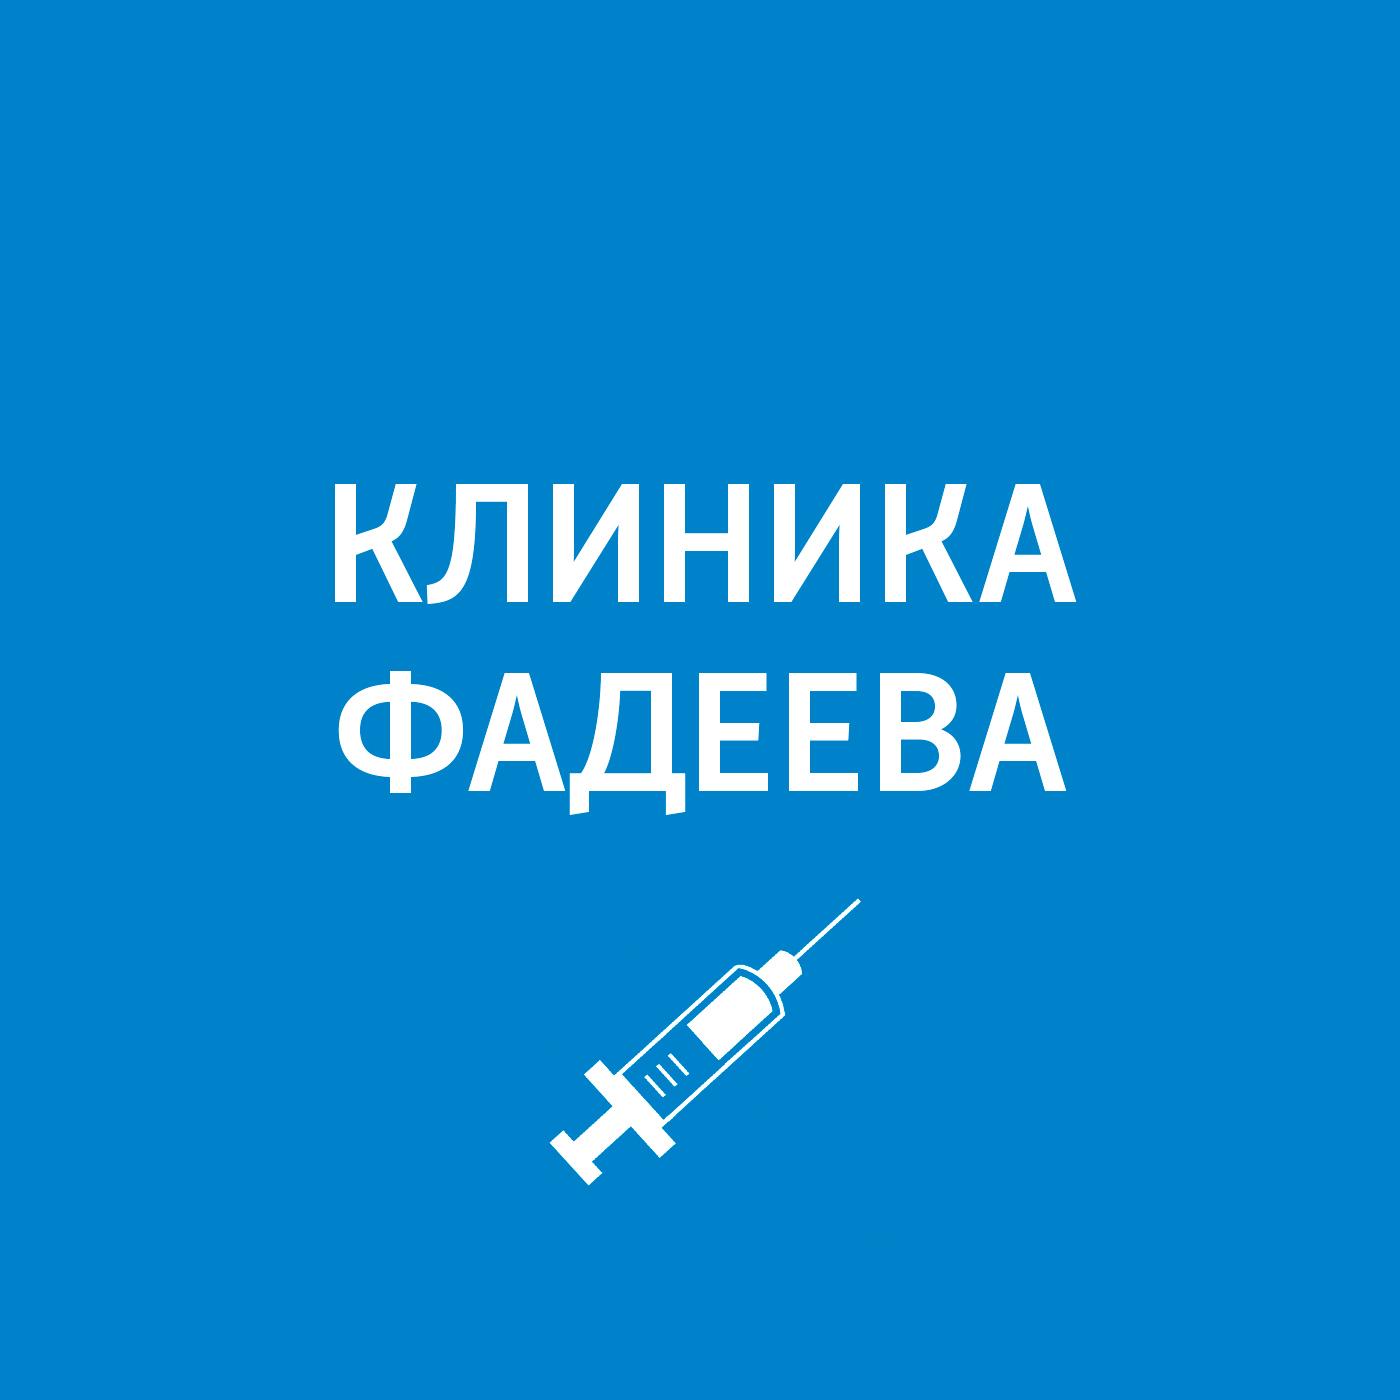 Пётр Фадеев Болезни сердца пётр фадеев кинезиолог остеопат